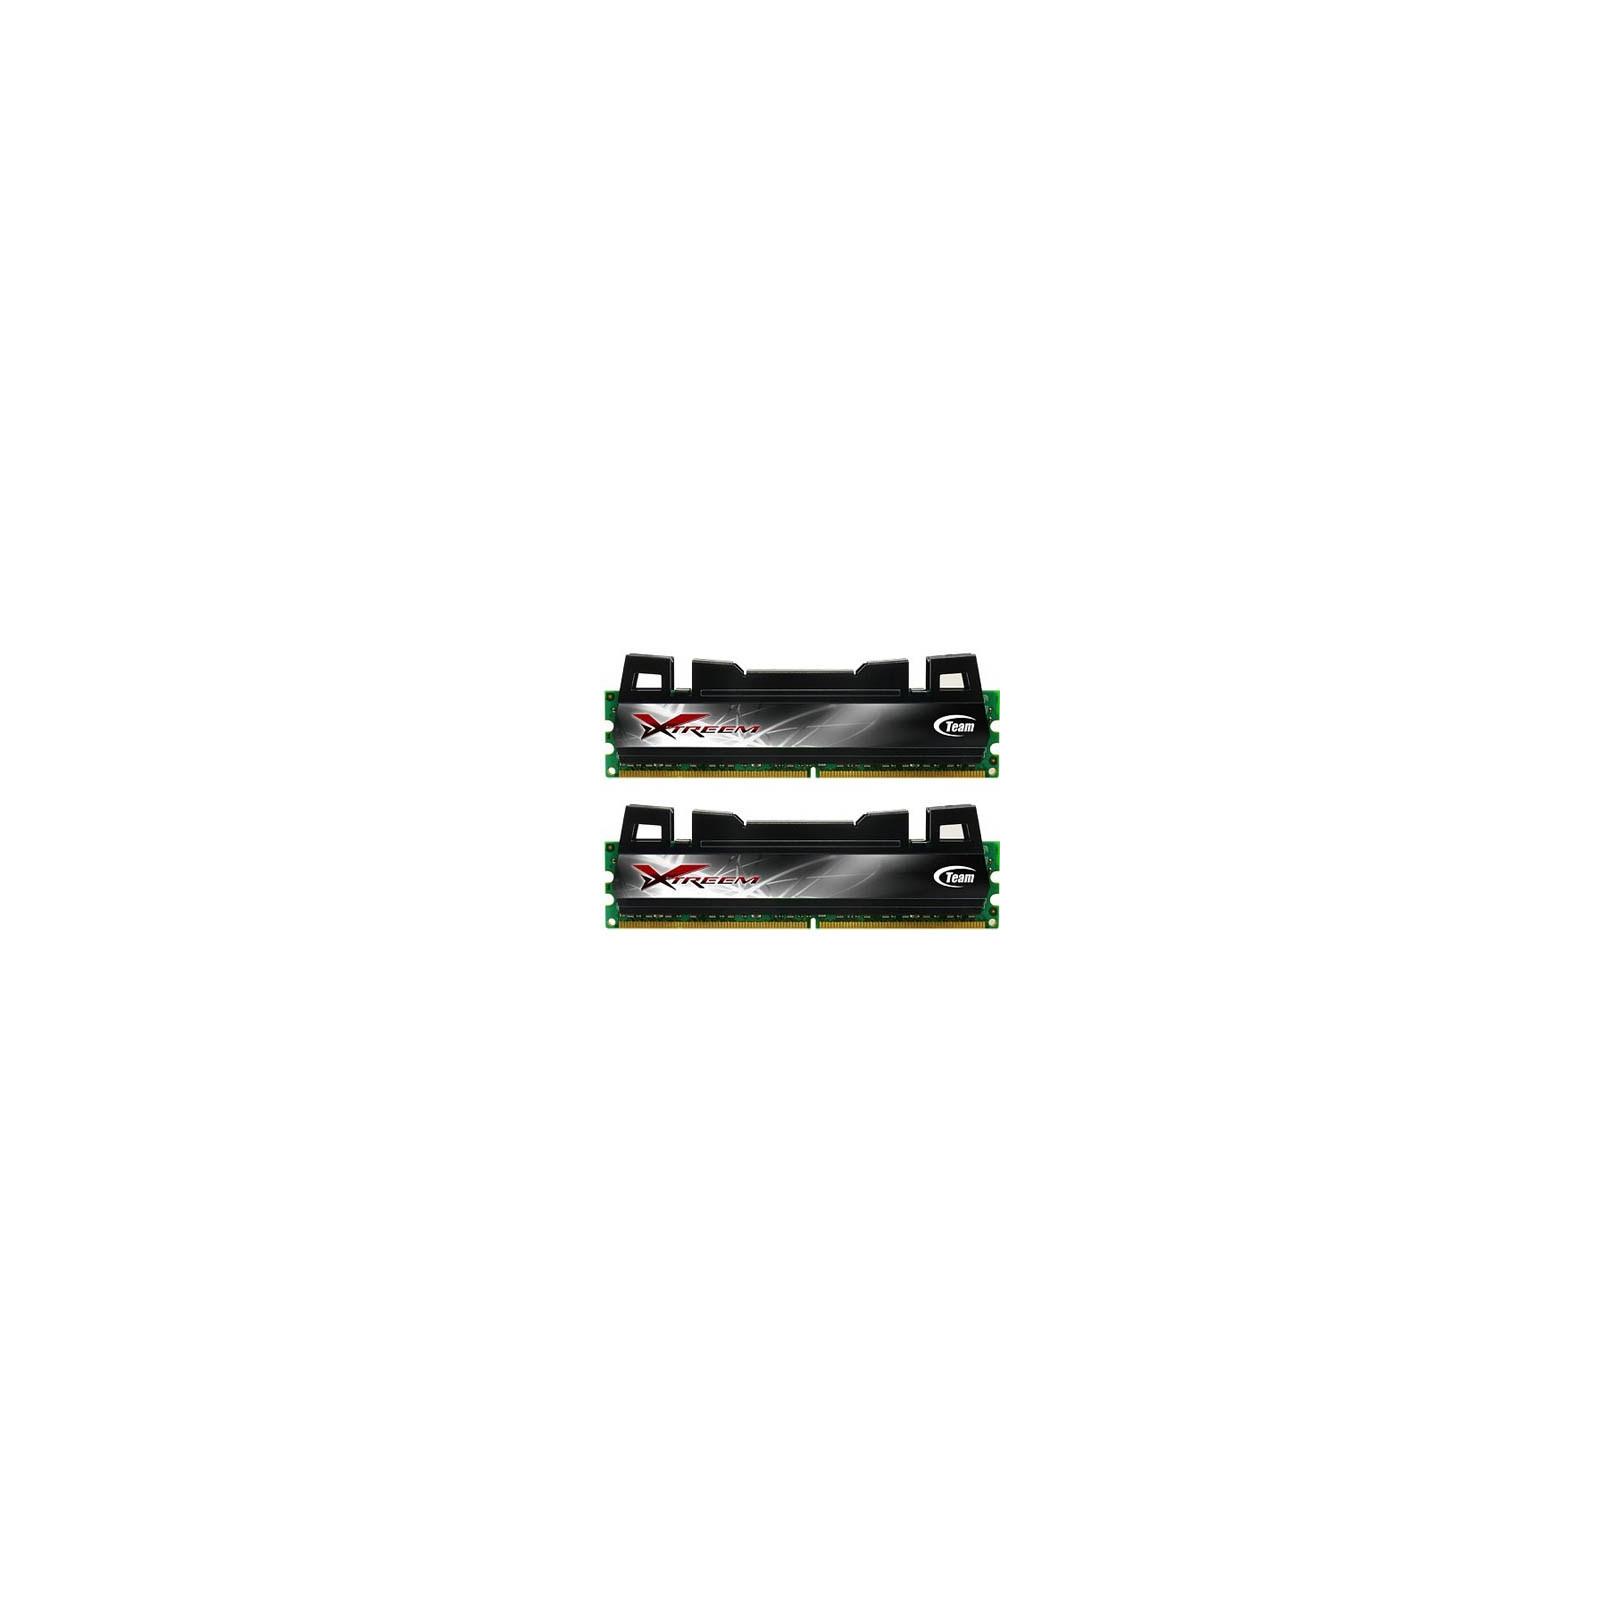 Модуль памяти для компьютера DDR3 8GB (2x4GB) 1866 MHz Team (TDD38G1866HC9KDC01)